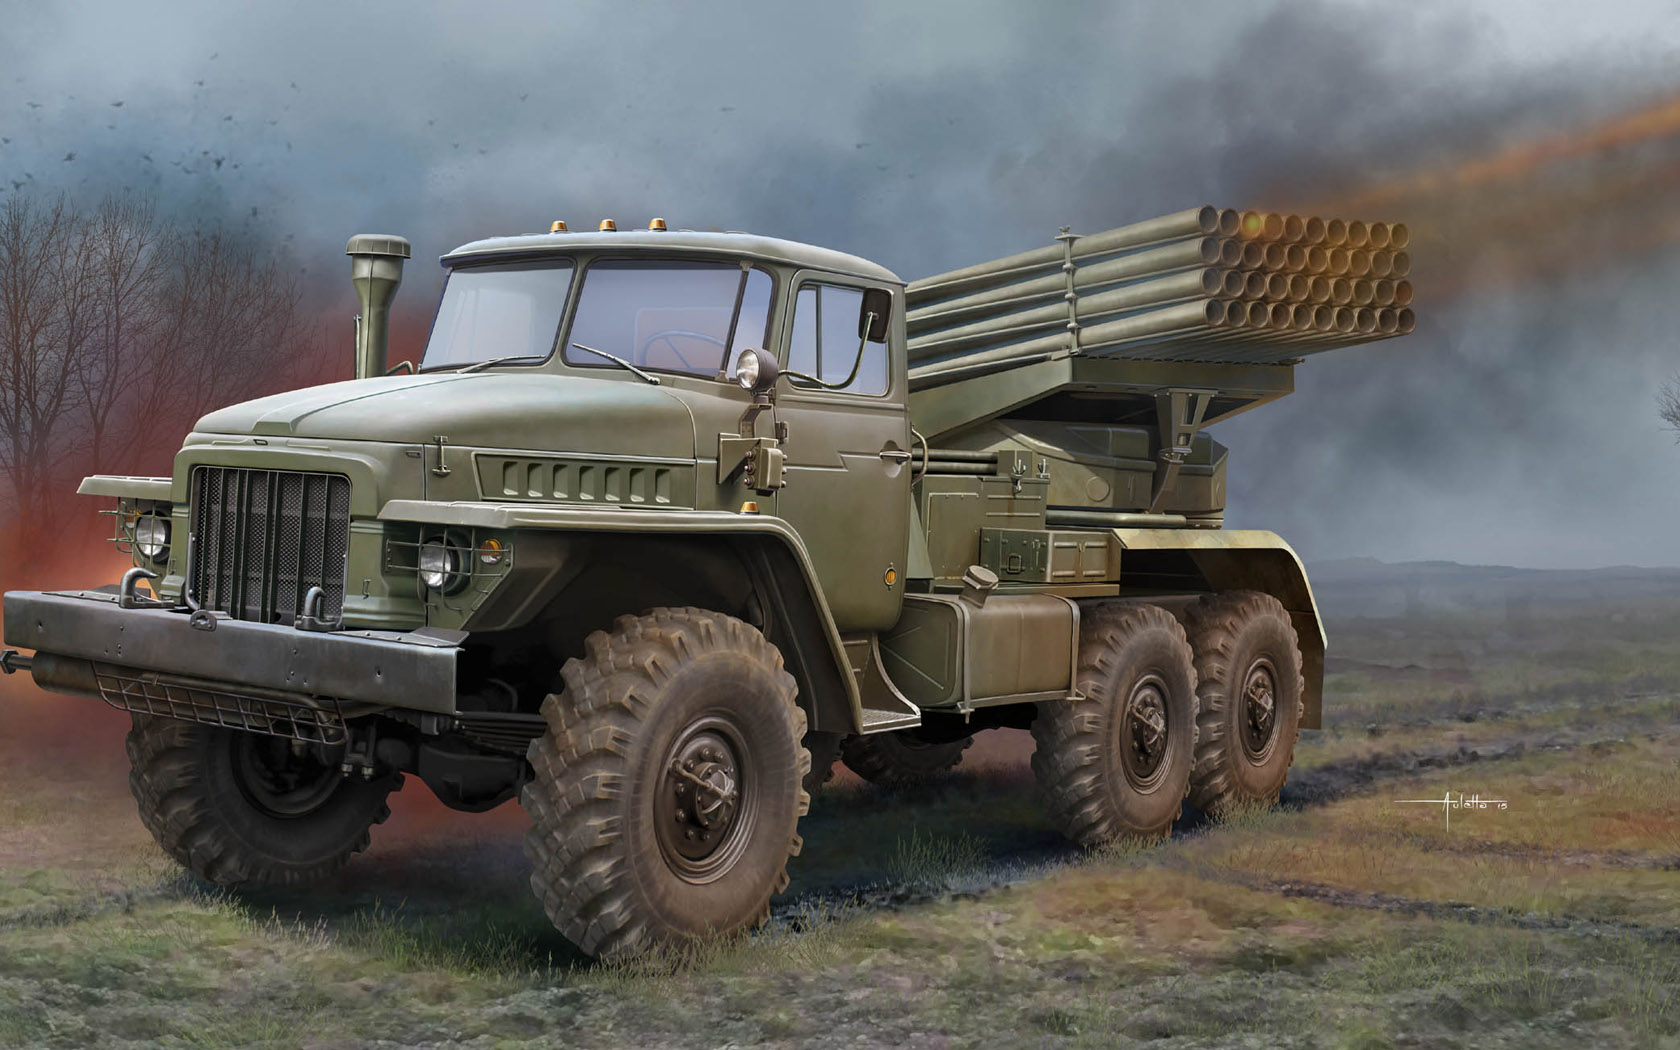 рисунок БМ-21 на базе Урал-375Д